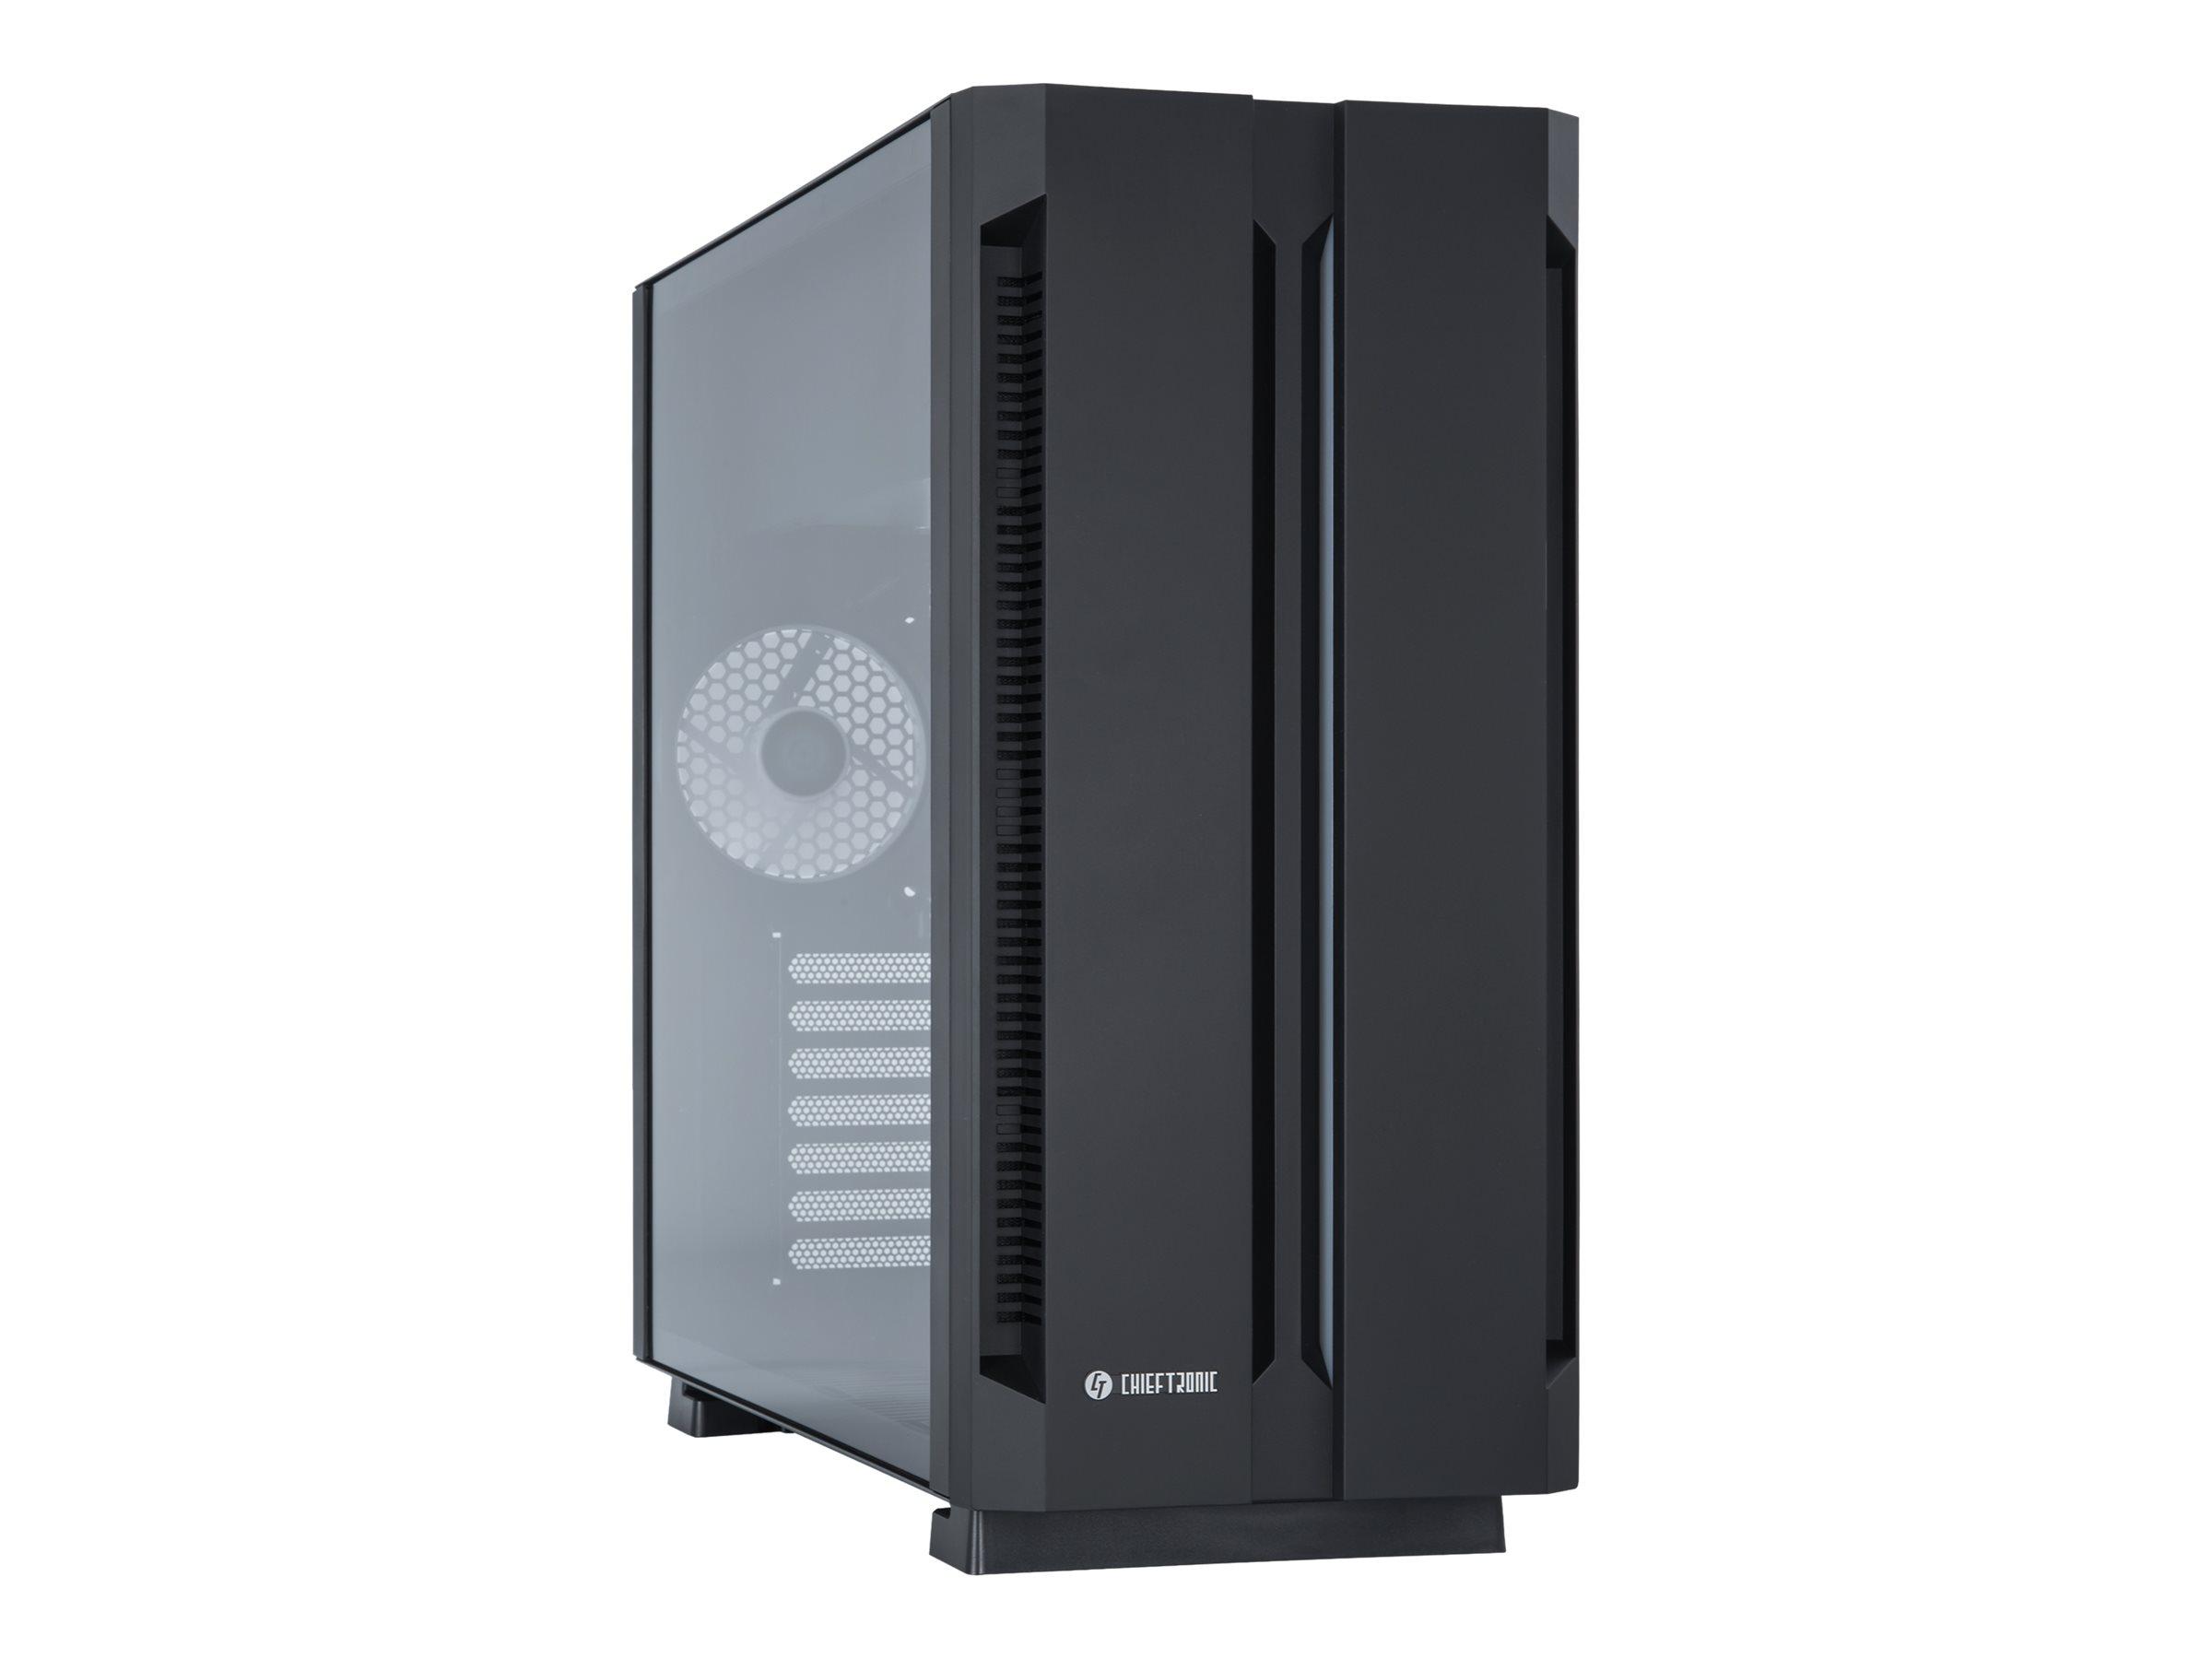 Chieftronic G1 - Tower - ATX - ohne Netzteil (ATX) - Schwarz - USB/Audio